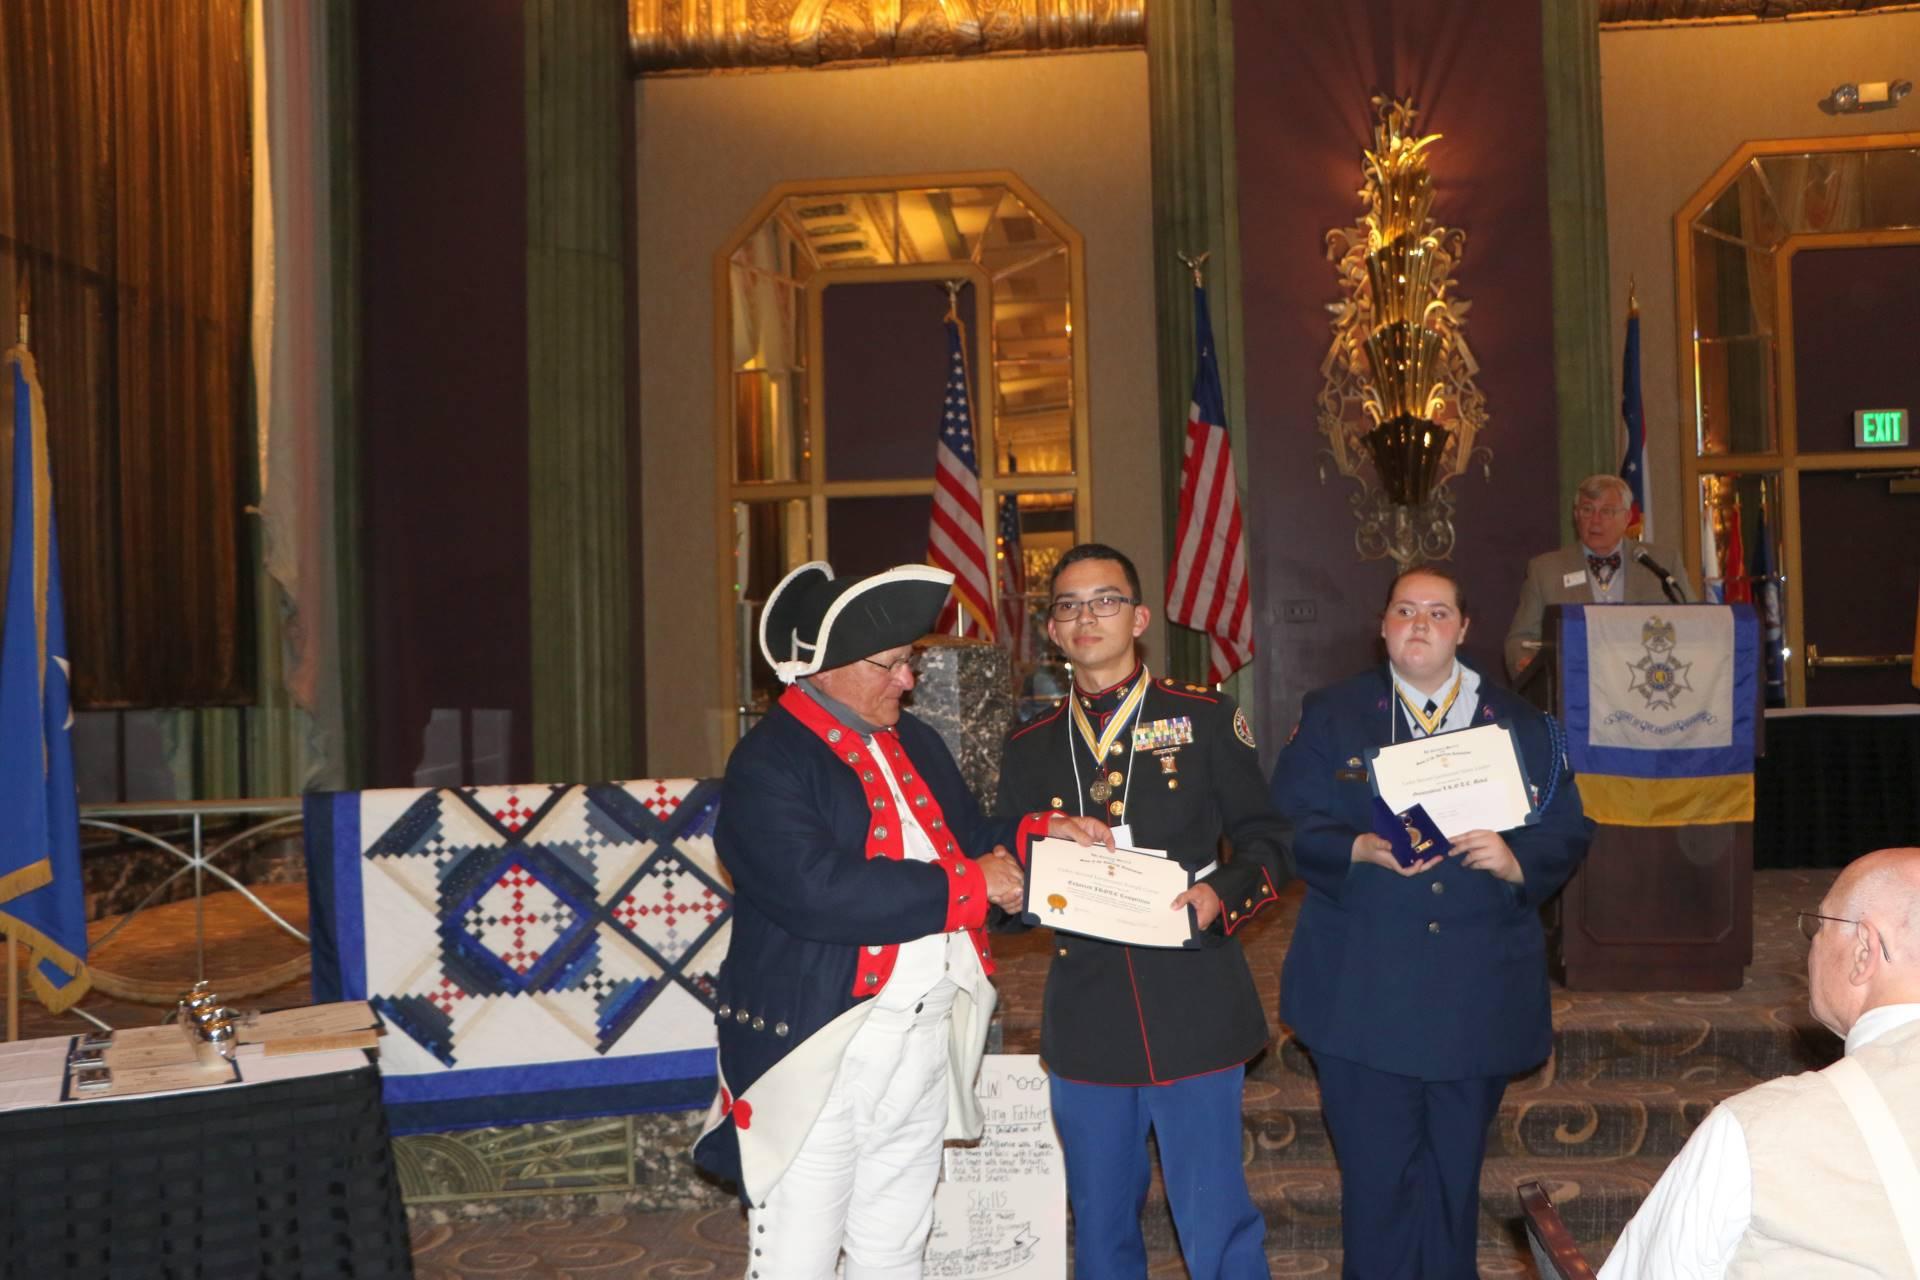 Cadet Joseph Castle receives the Sons of the American Revolution Enhanced Program Scholarship